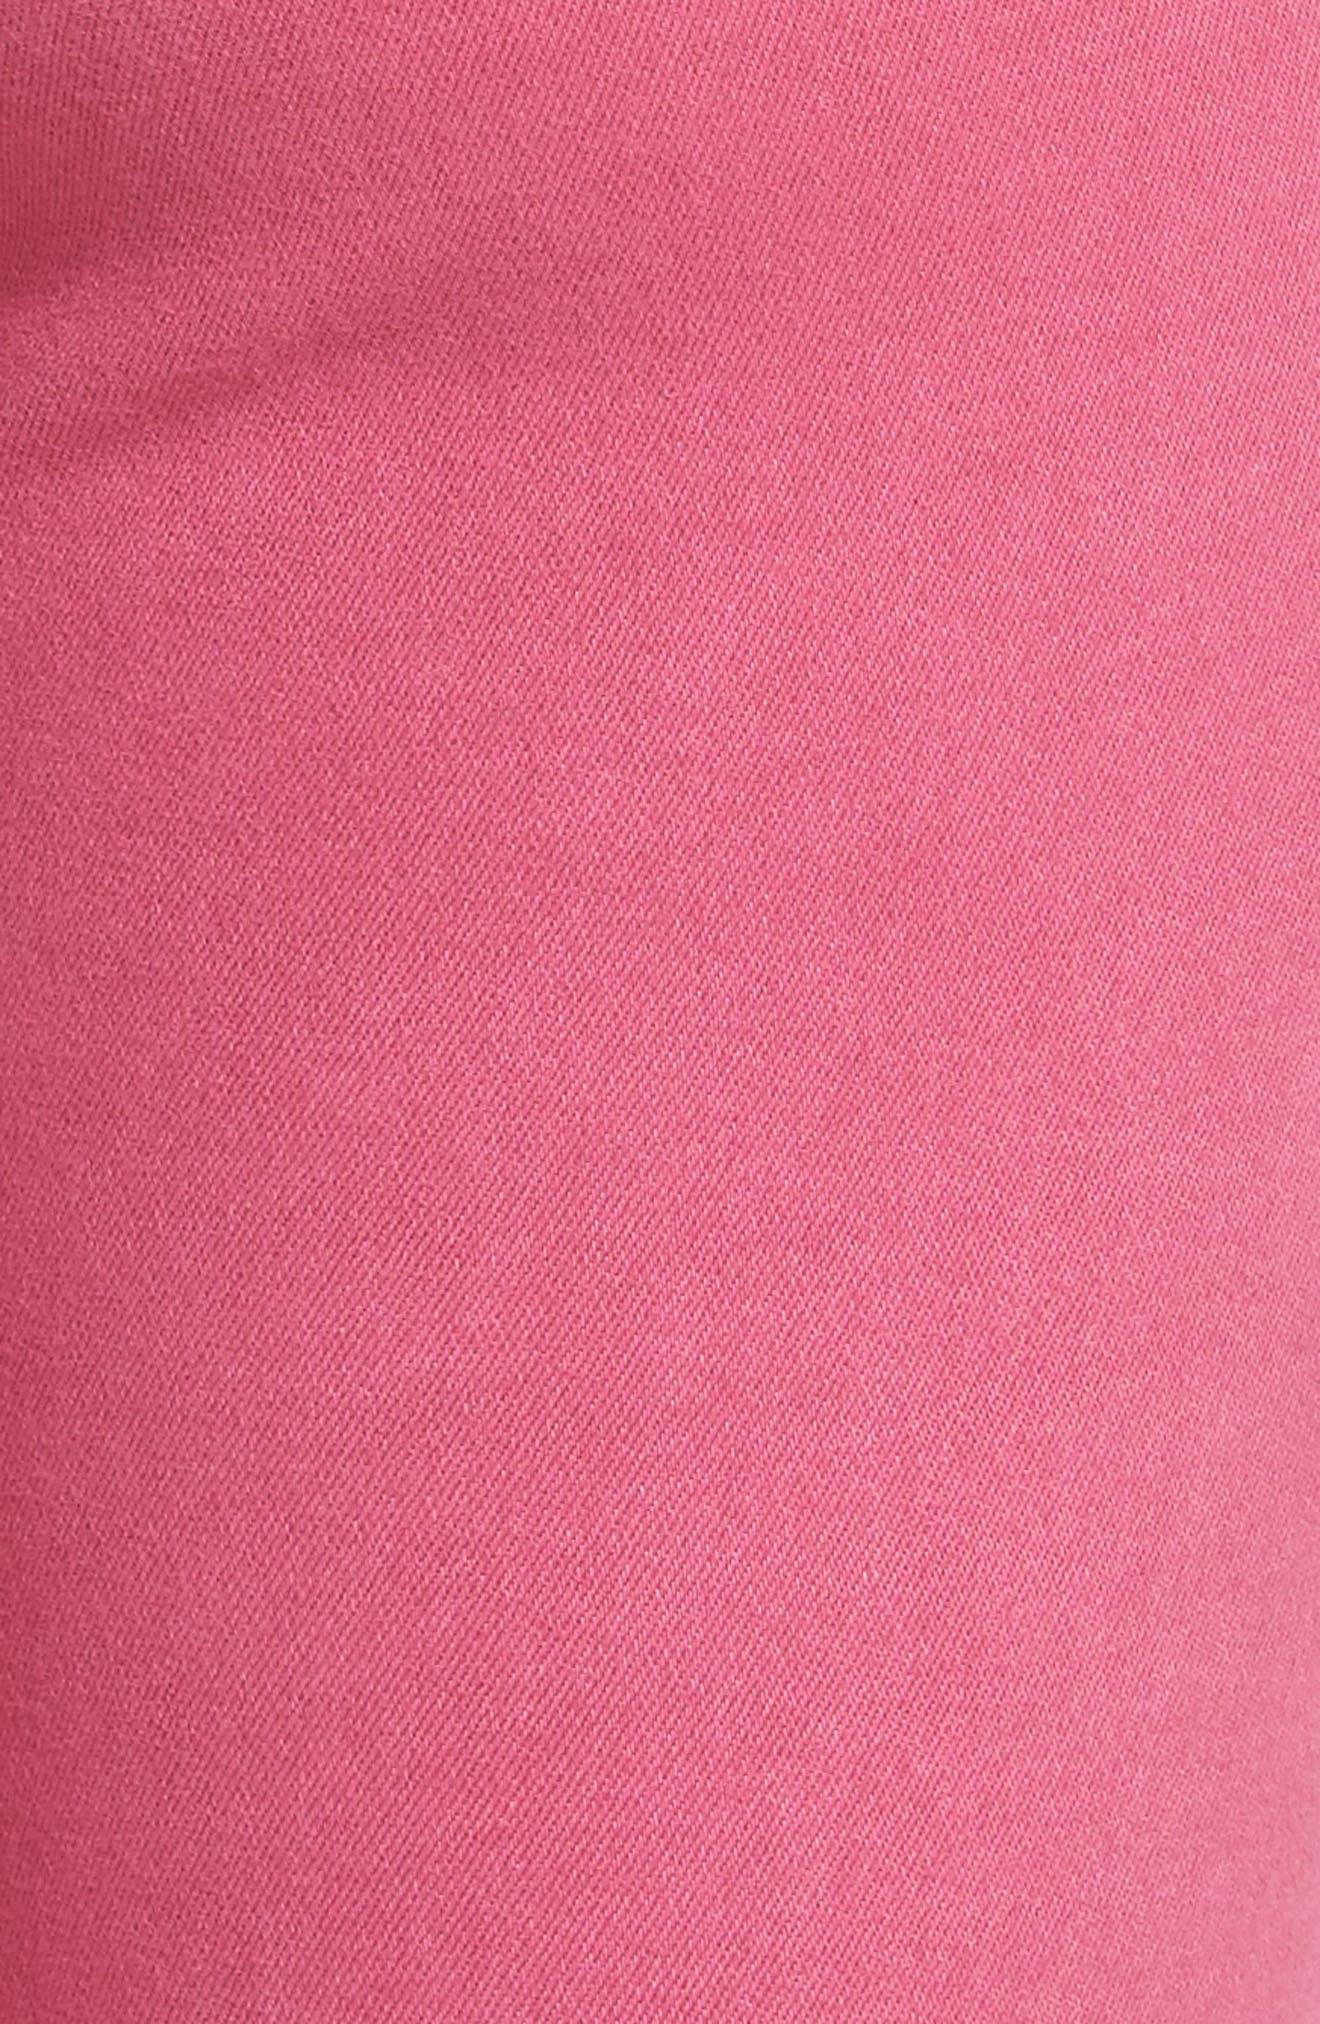 Connie Frayed Hem Crop Skinny Jeans,                             Alternate thumbnail 5, color,                             665